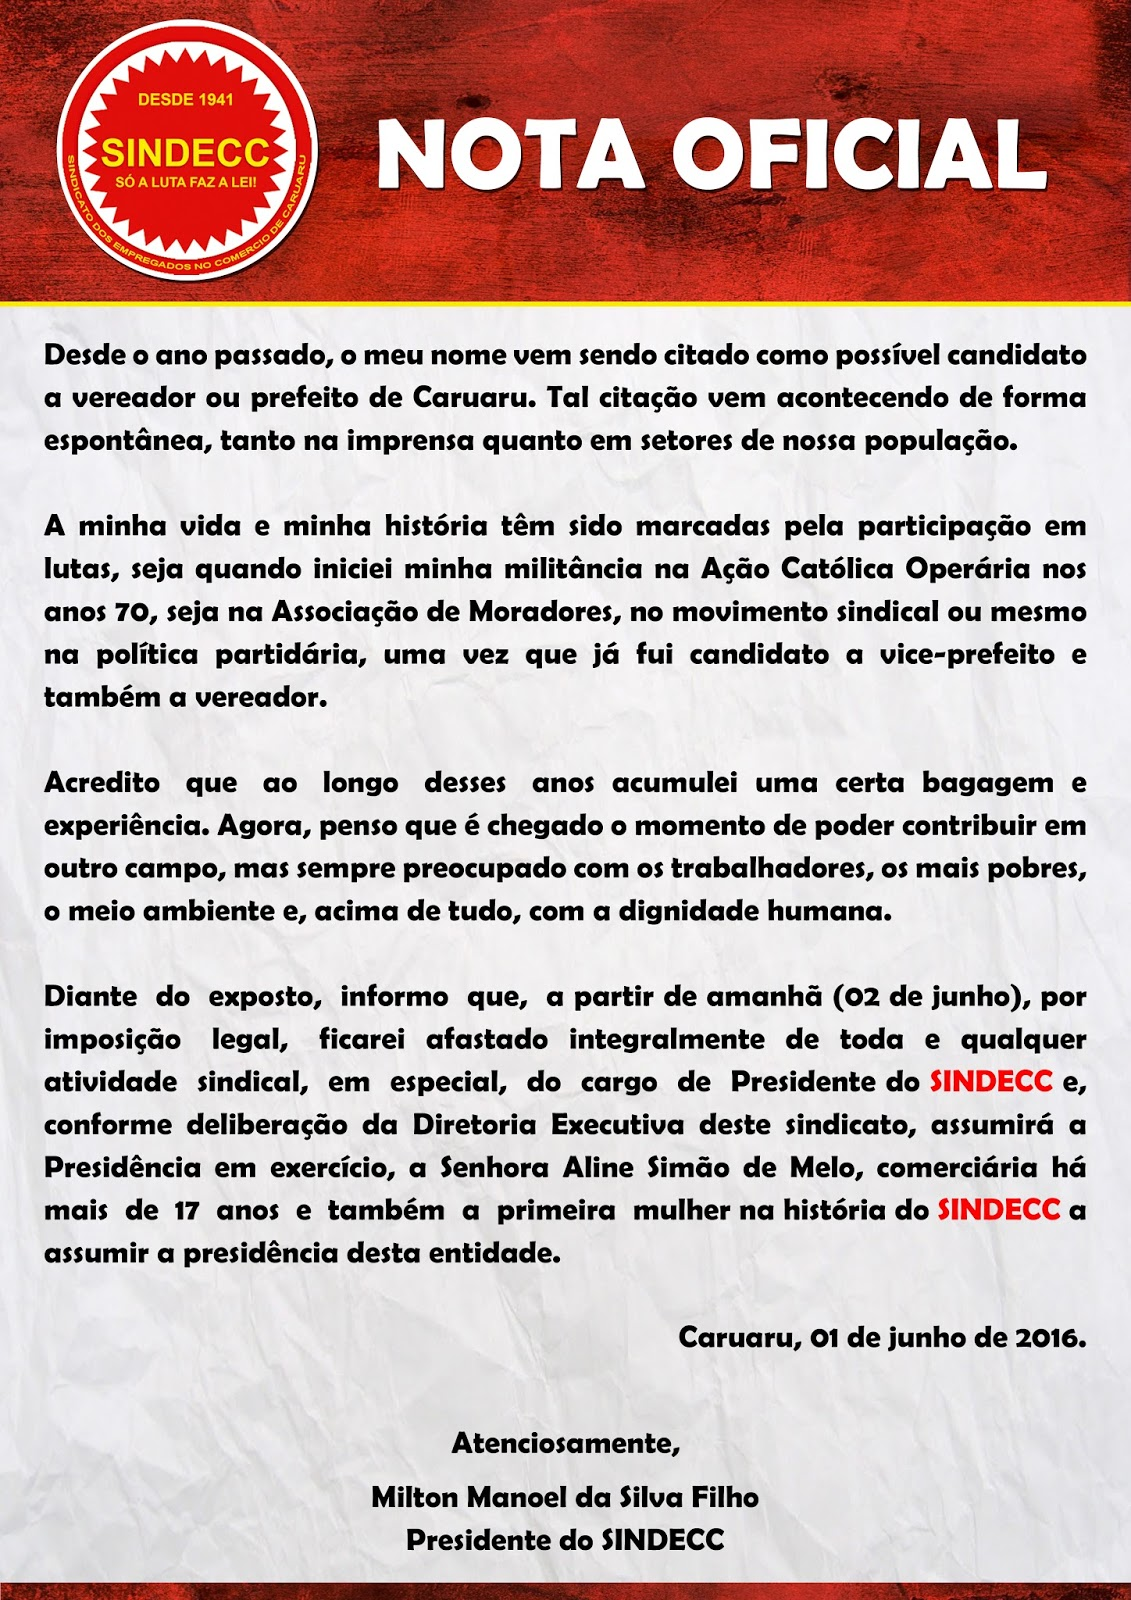 nota-oficial-sindecc